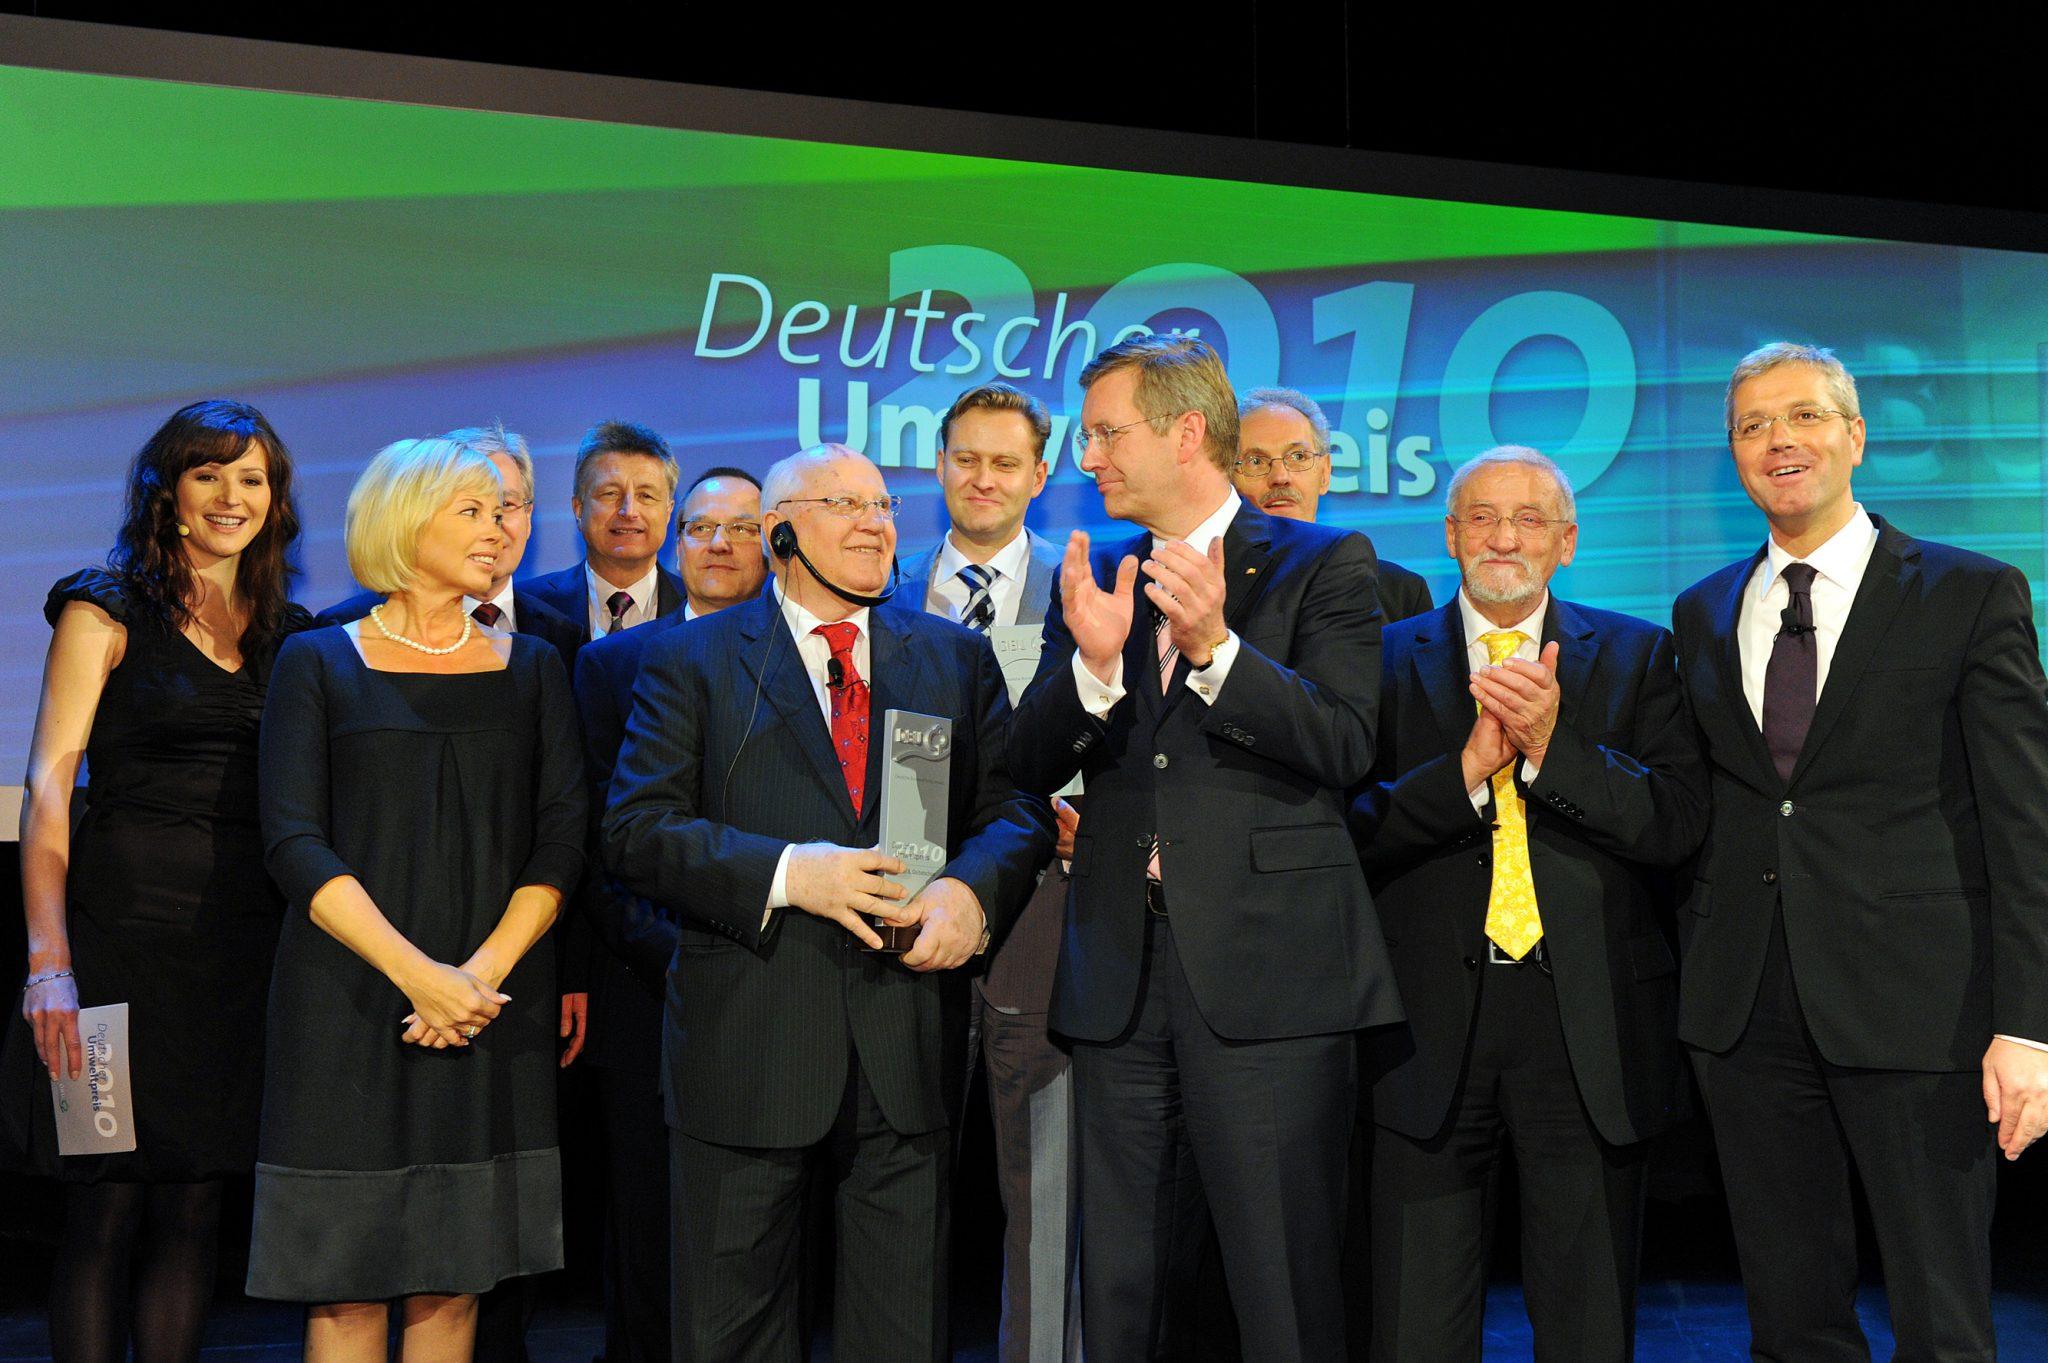 Buehne Preistraeger DBU 2010